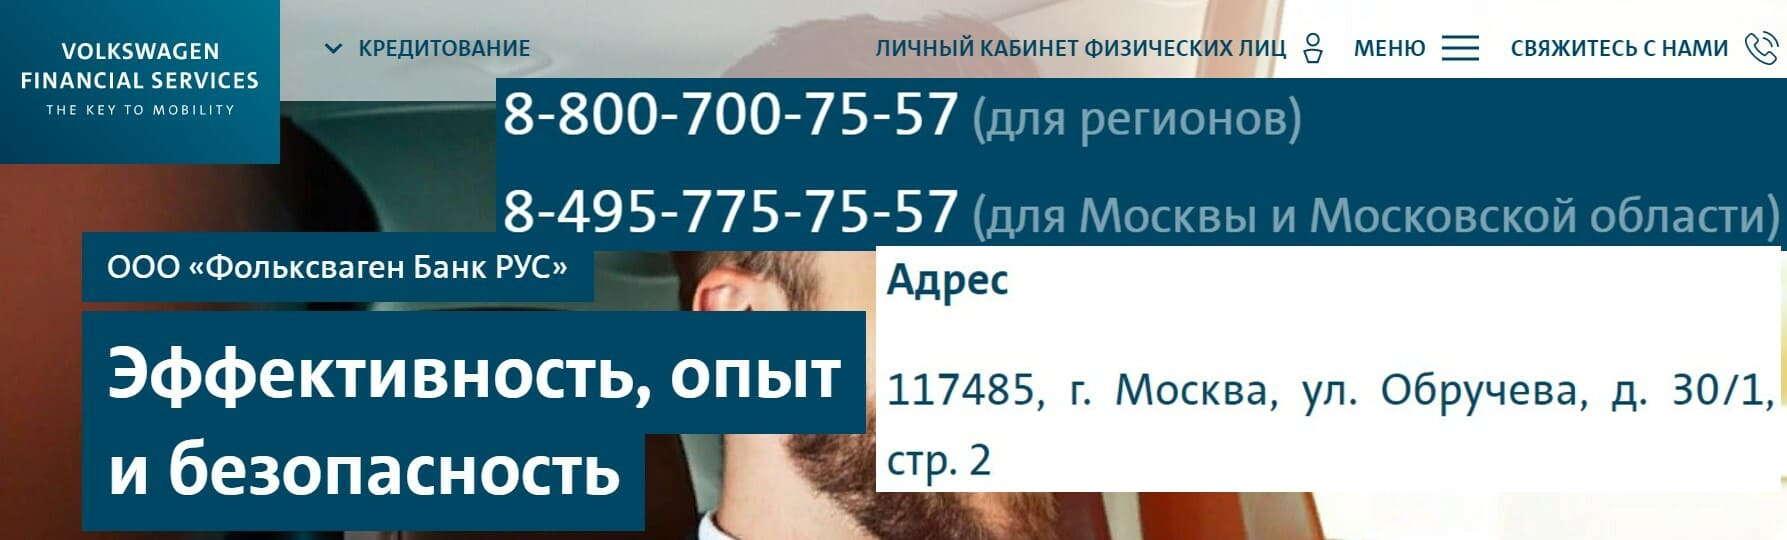 Фольксваген банк сайт